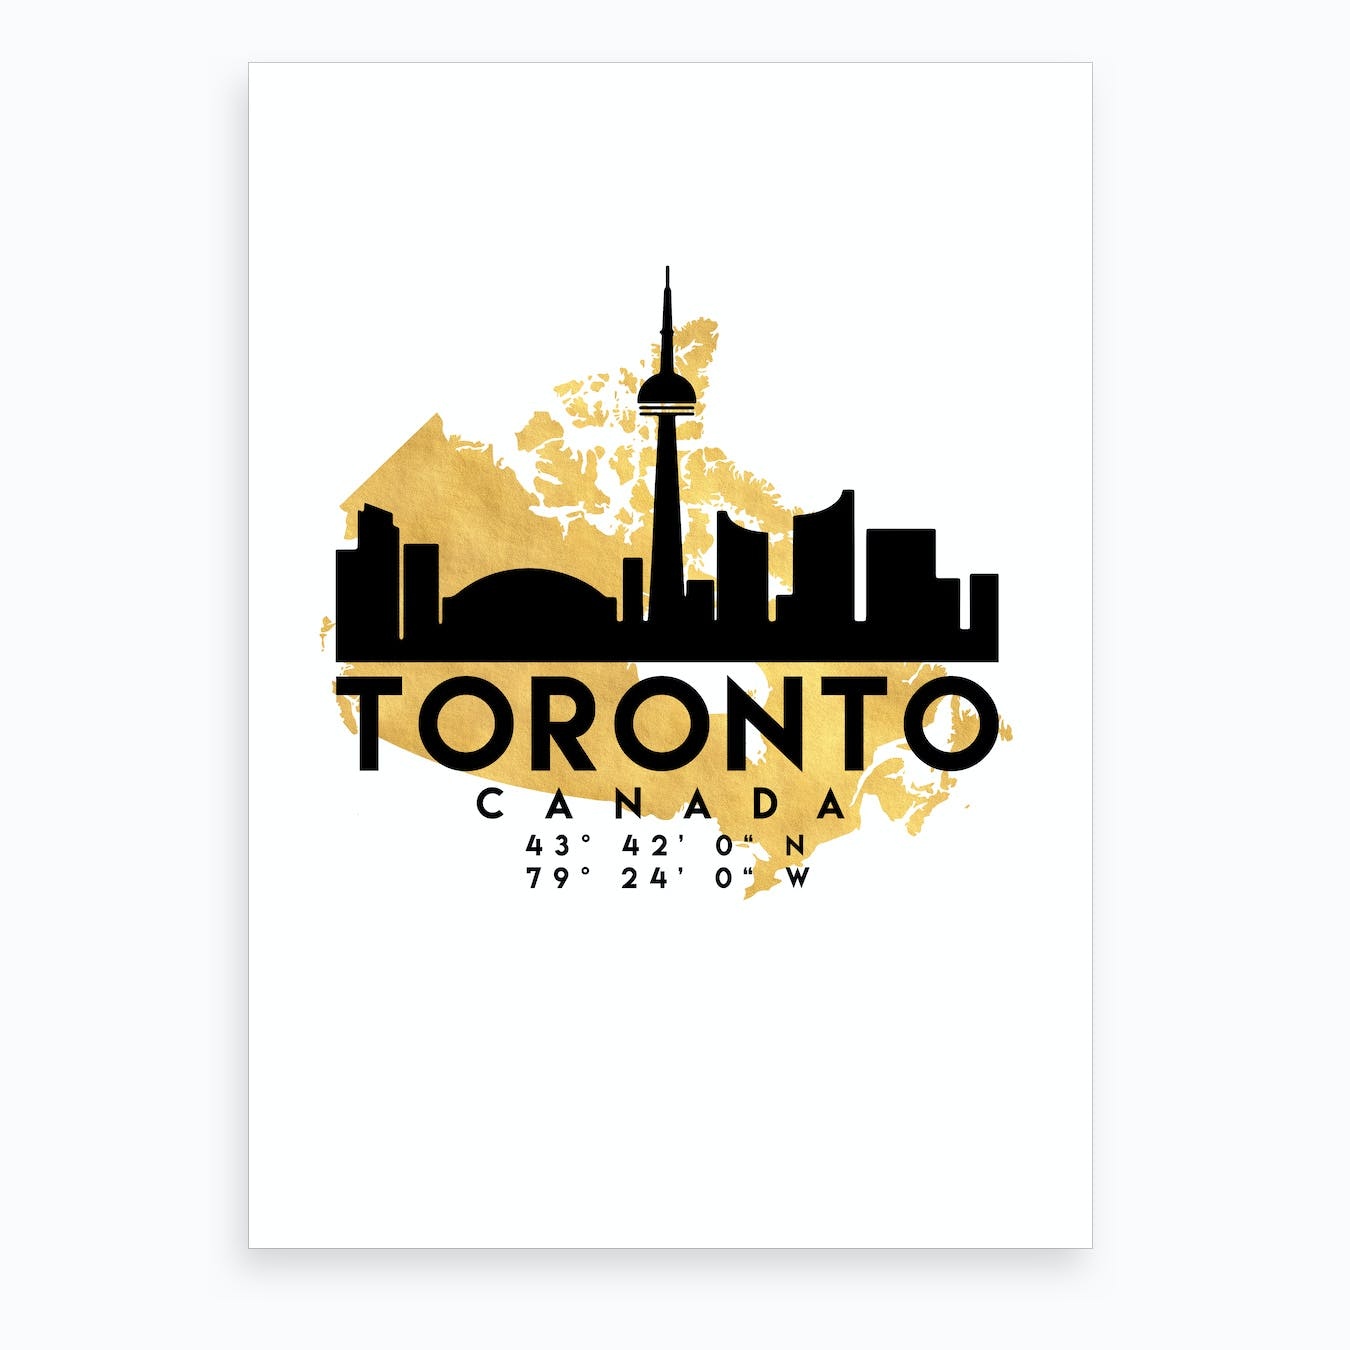 Toronto Canada Silhouette City Skyline Map